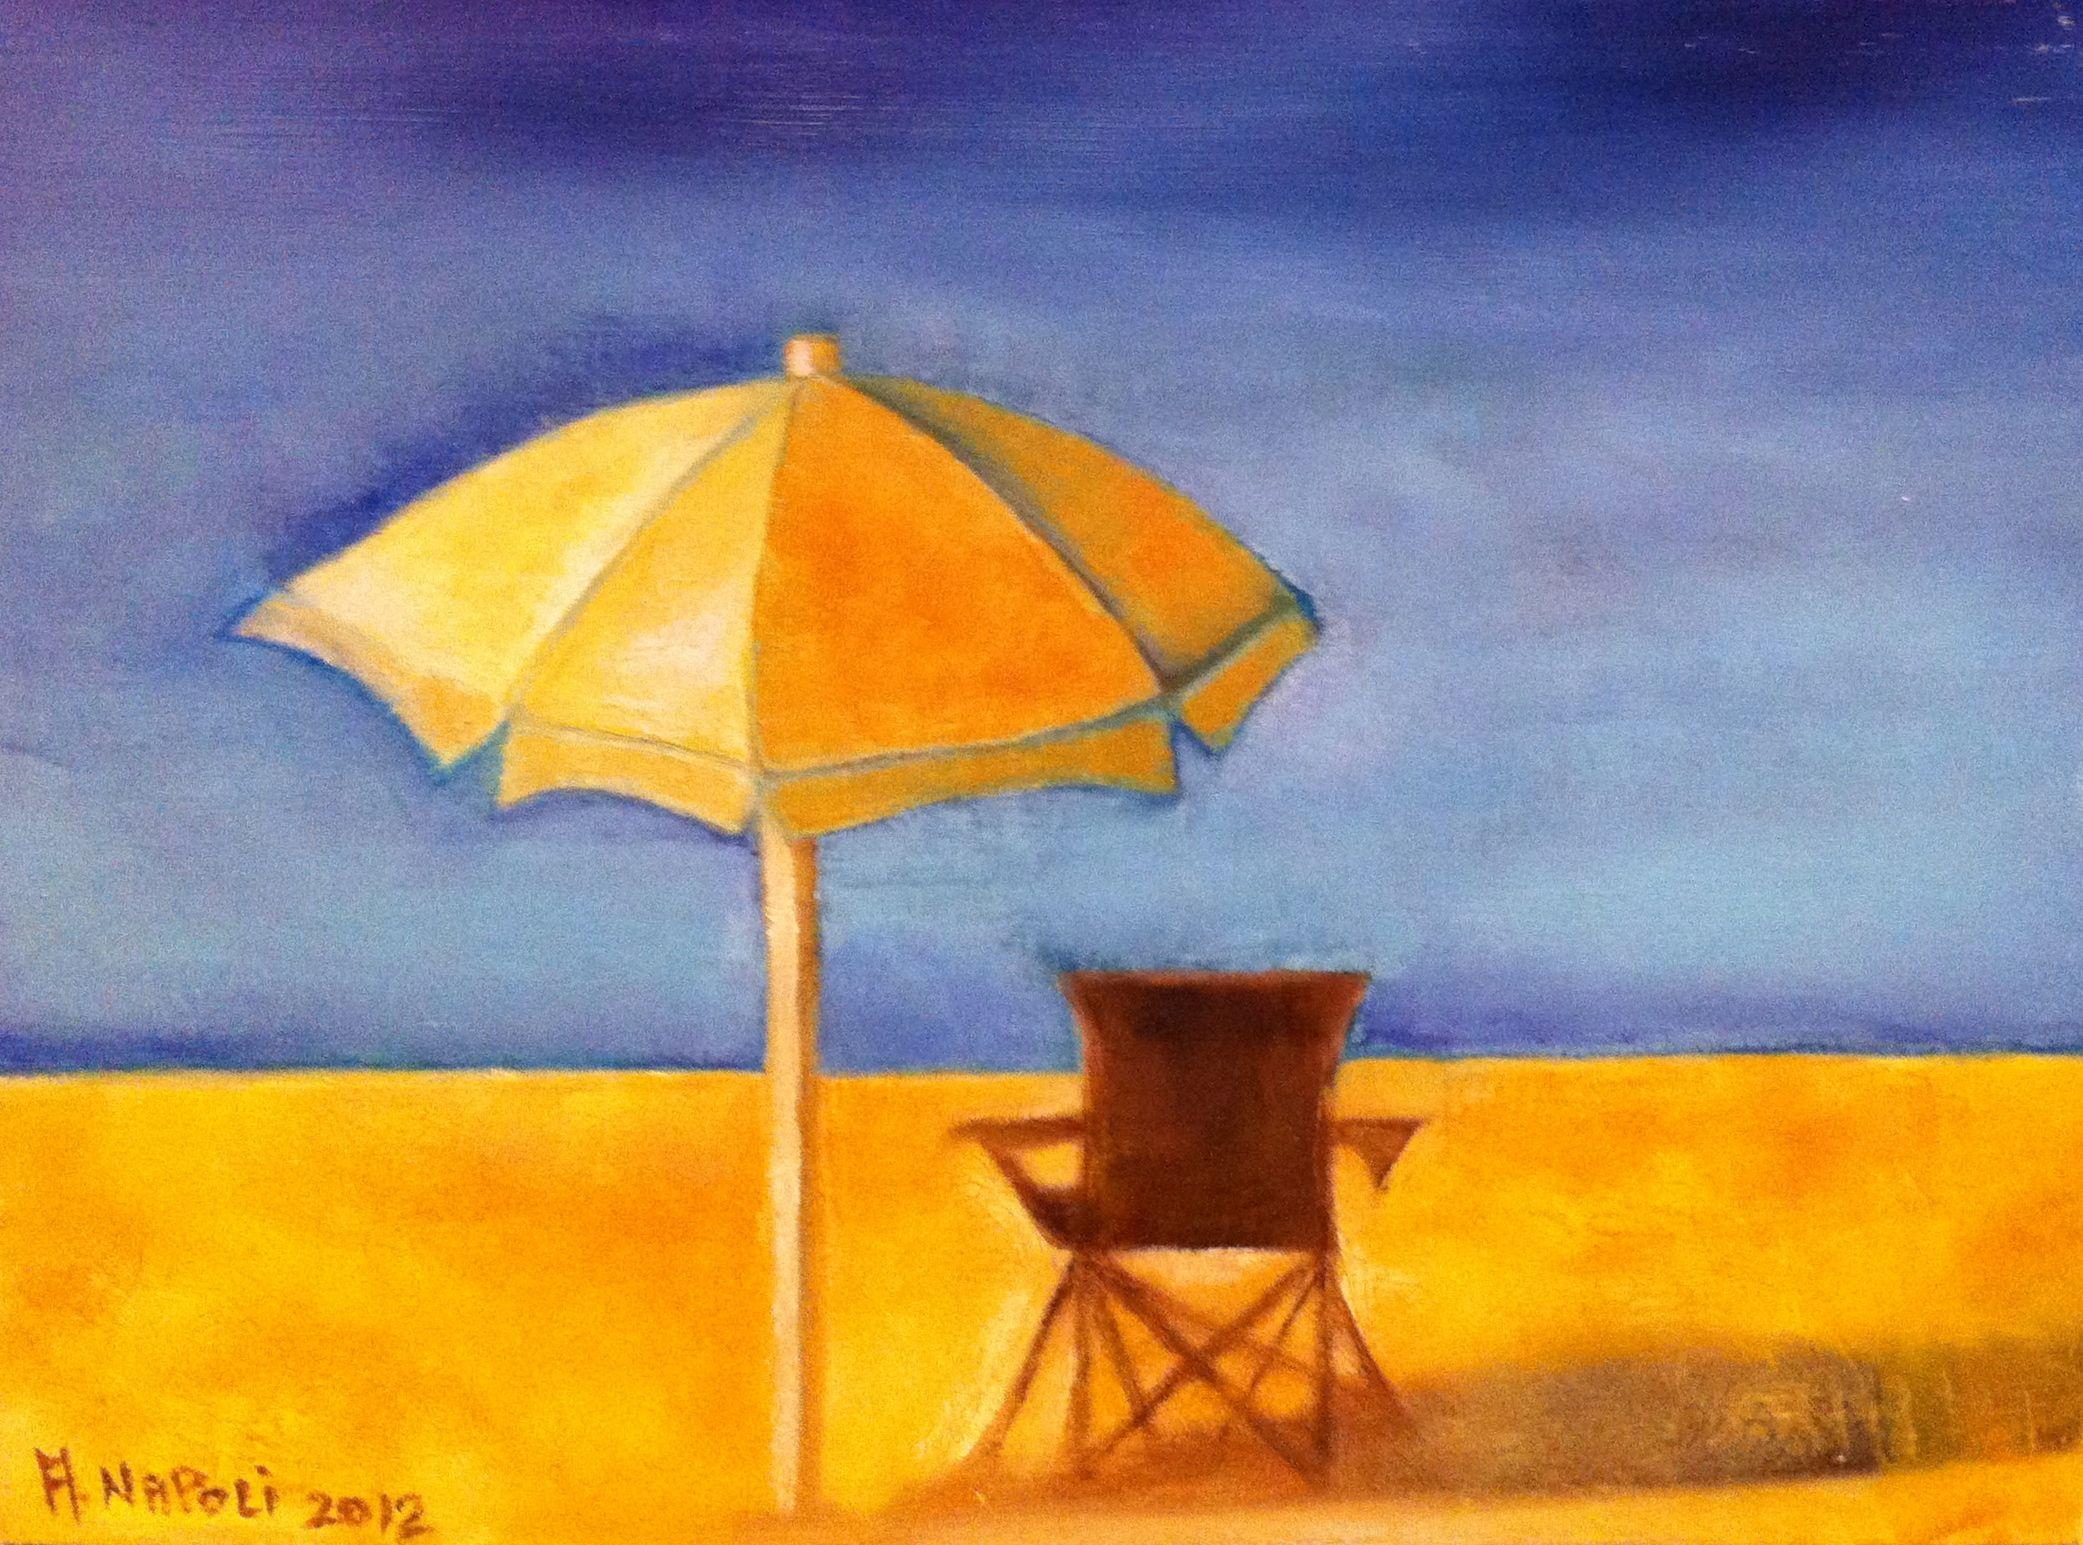 Sun Umbrella with chair